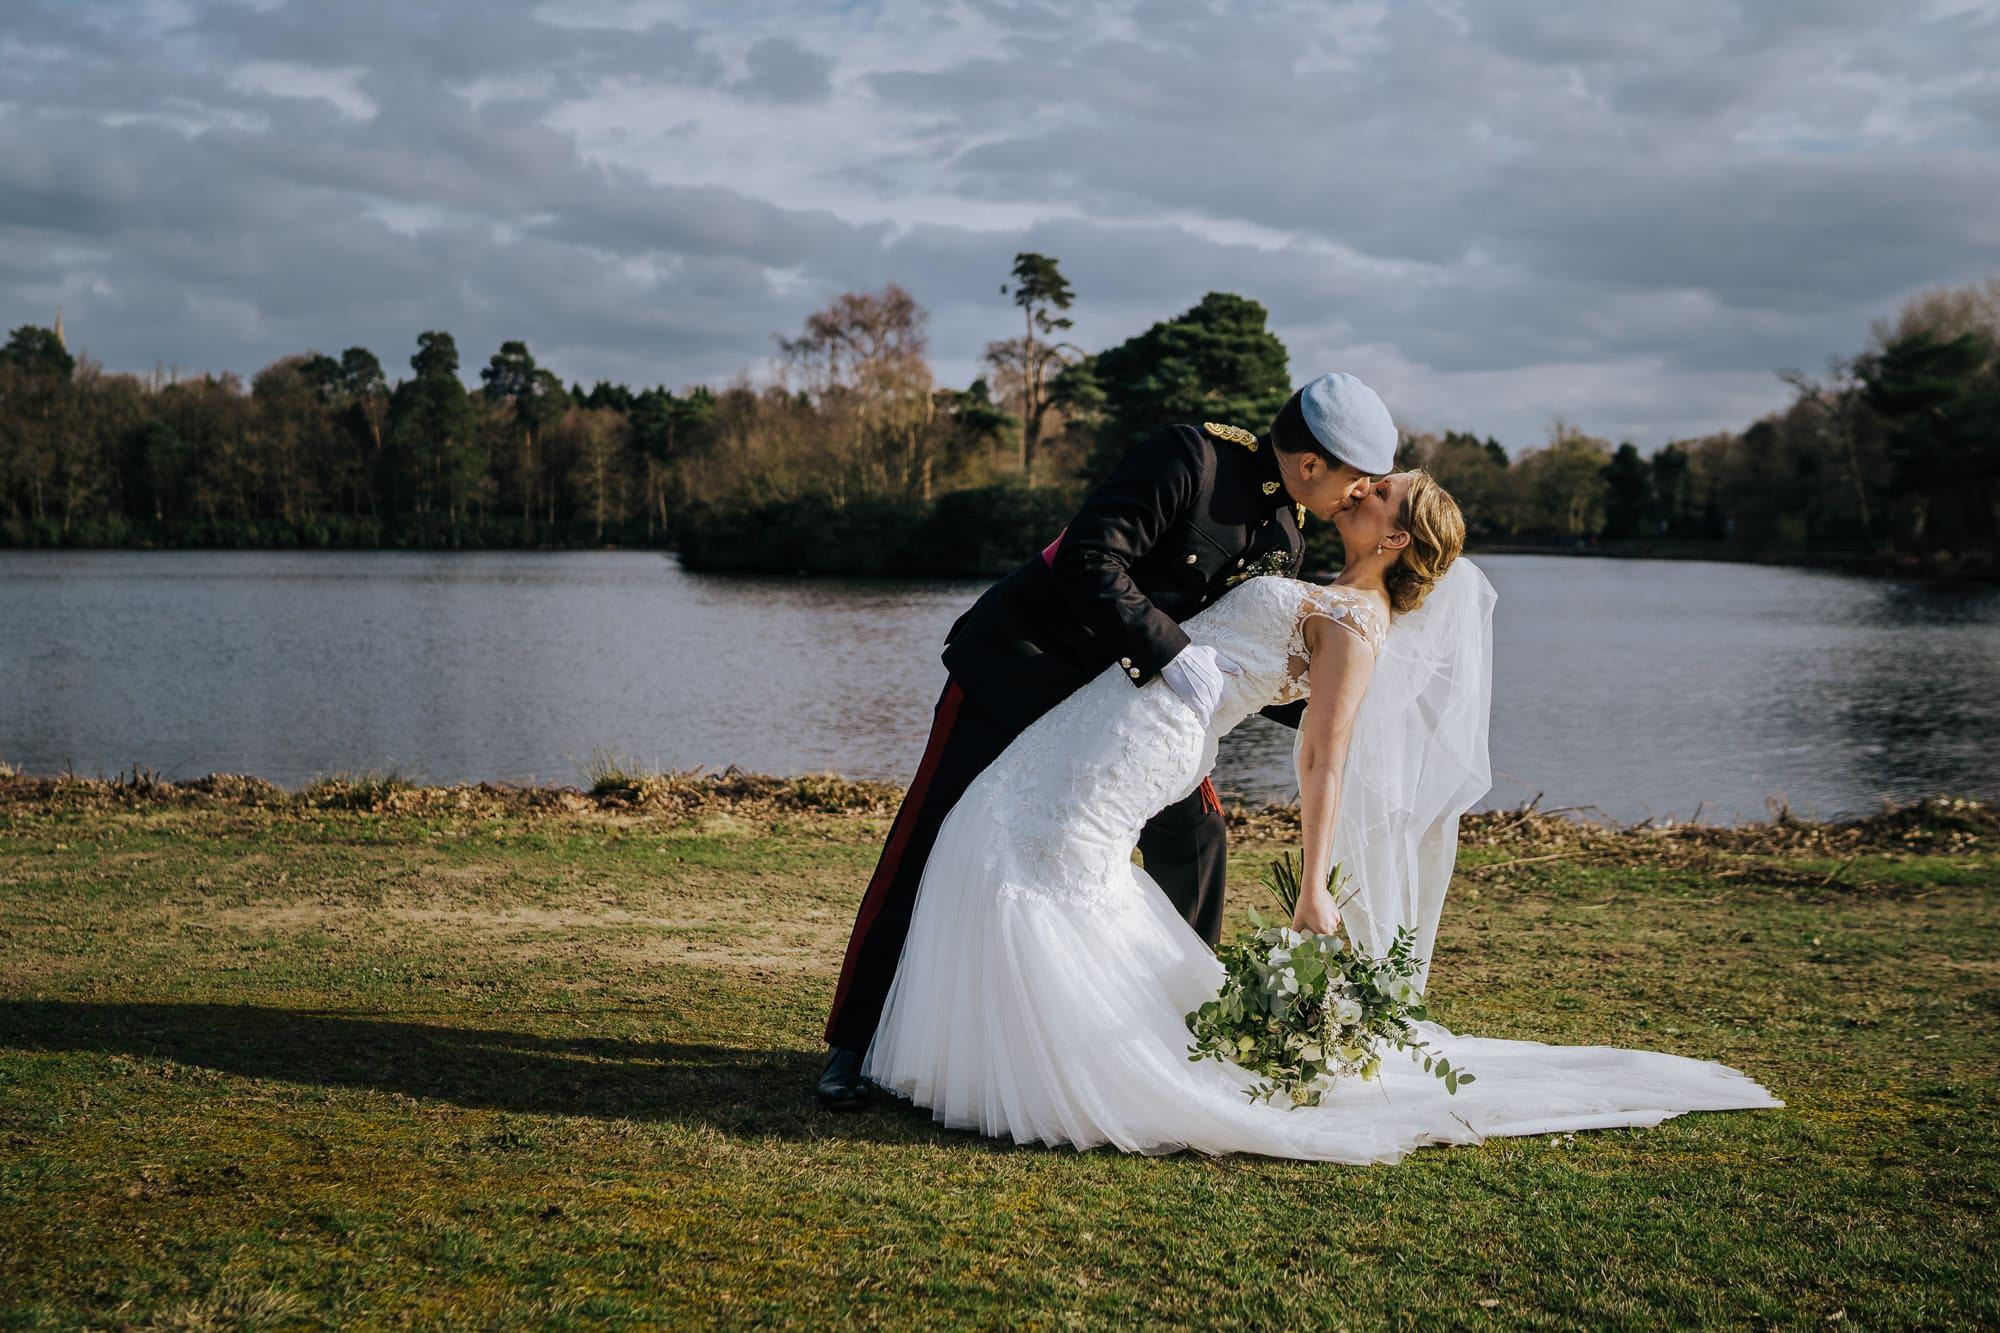 Wedding - Bridegroom